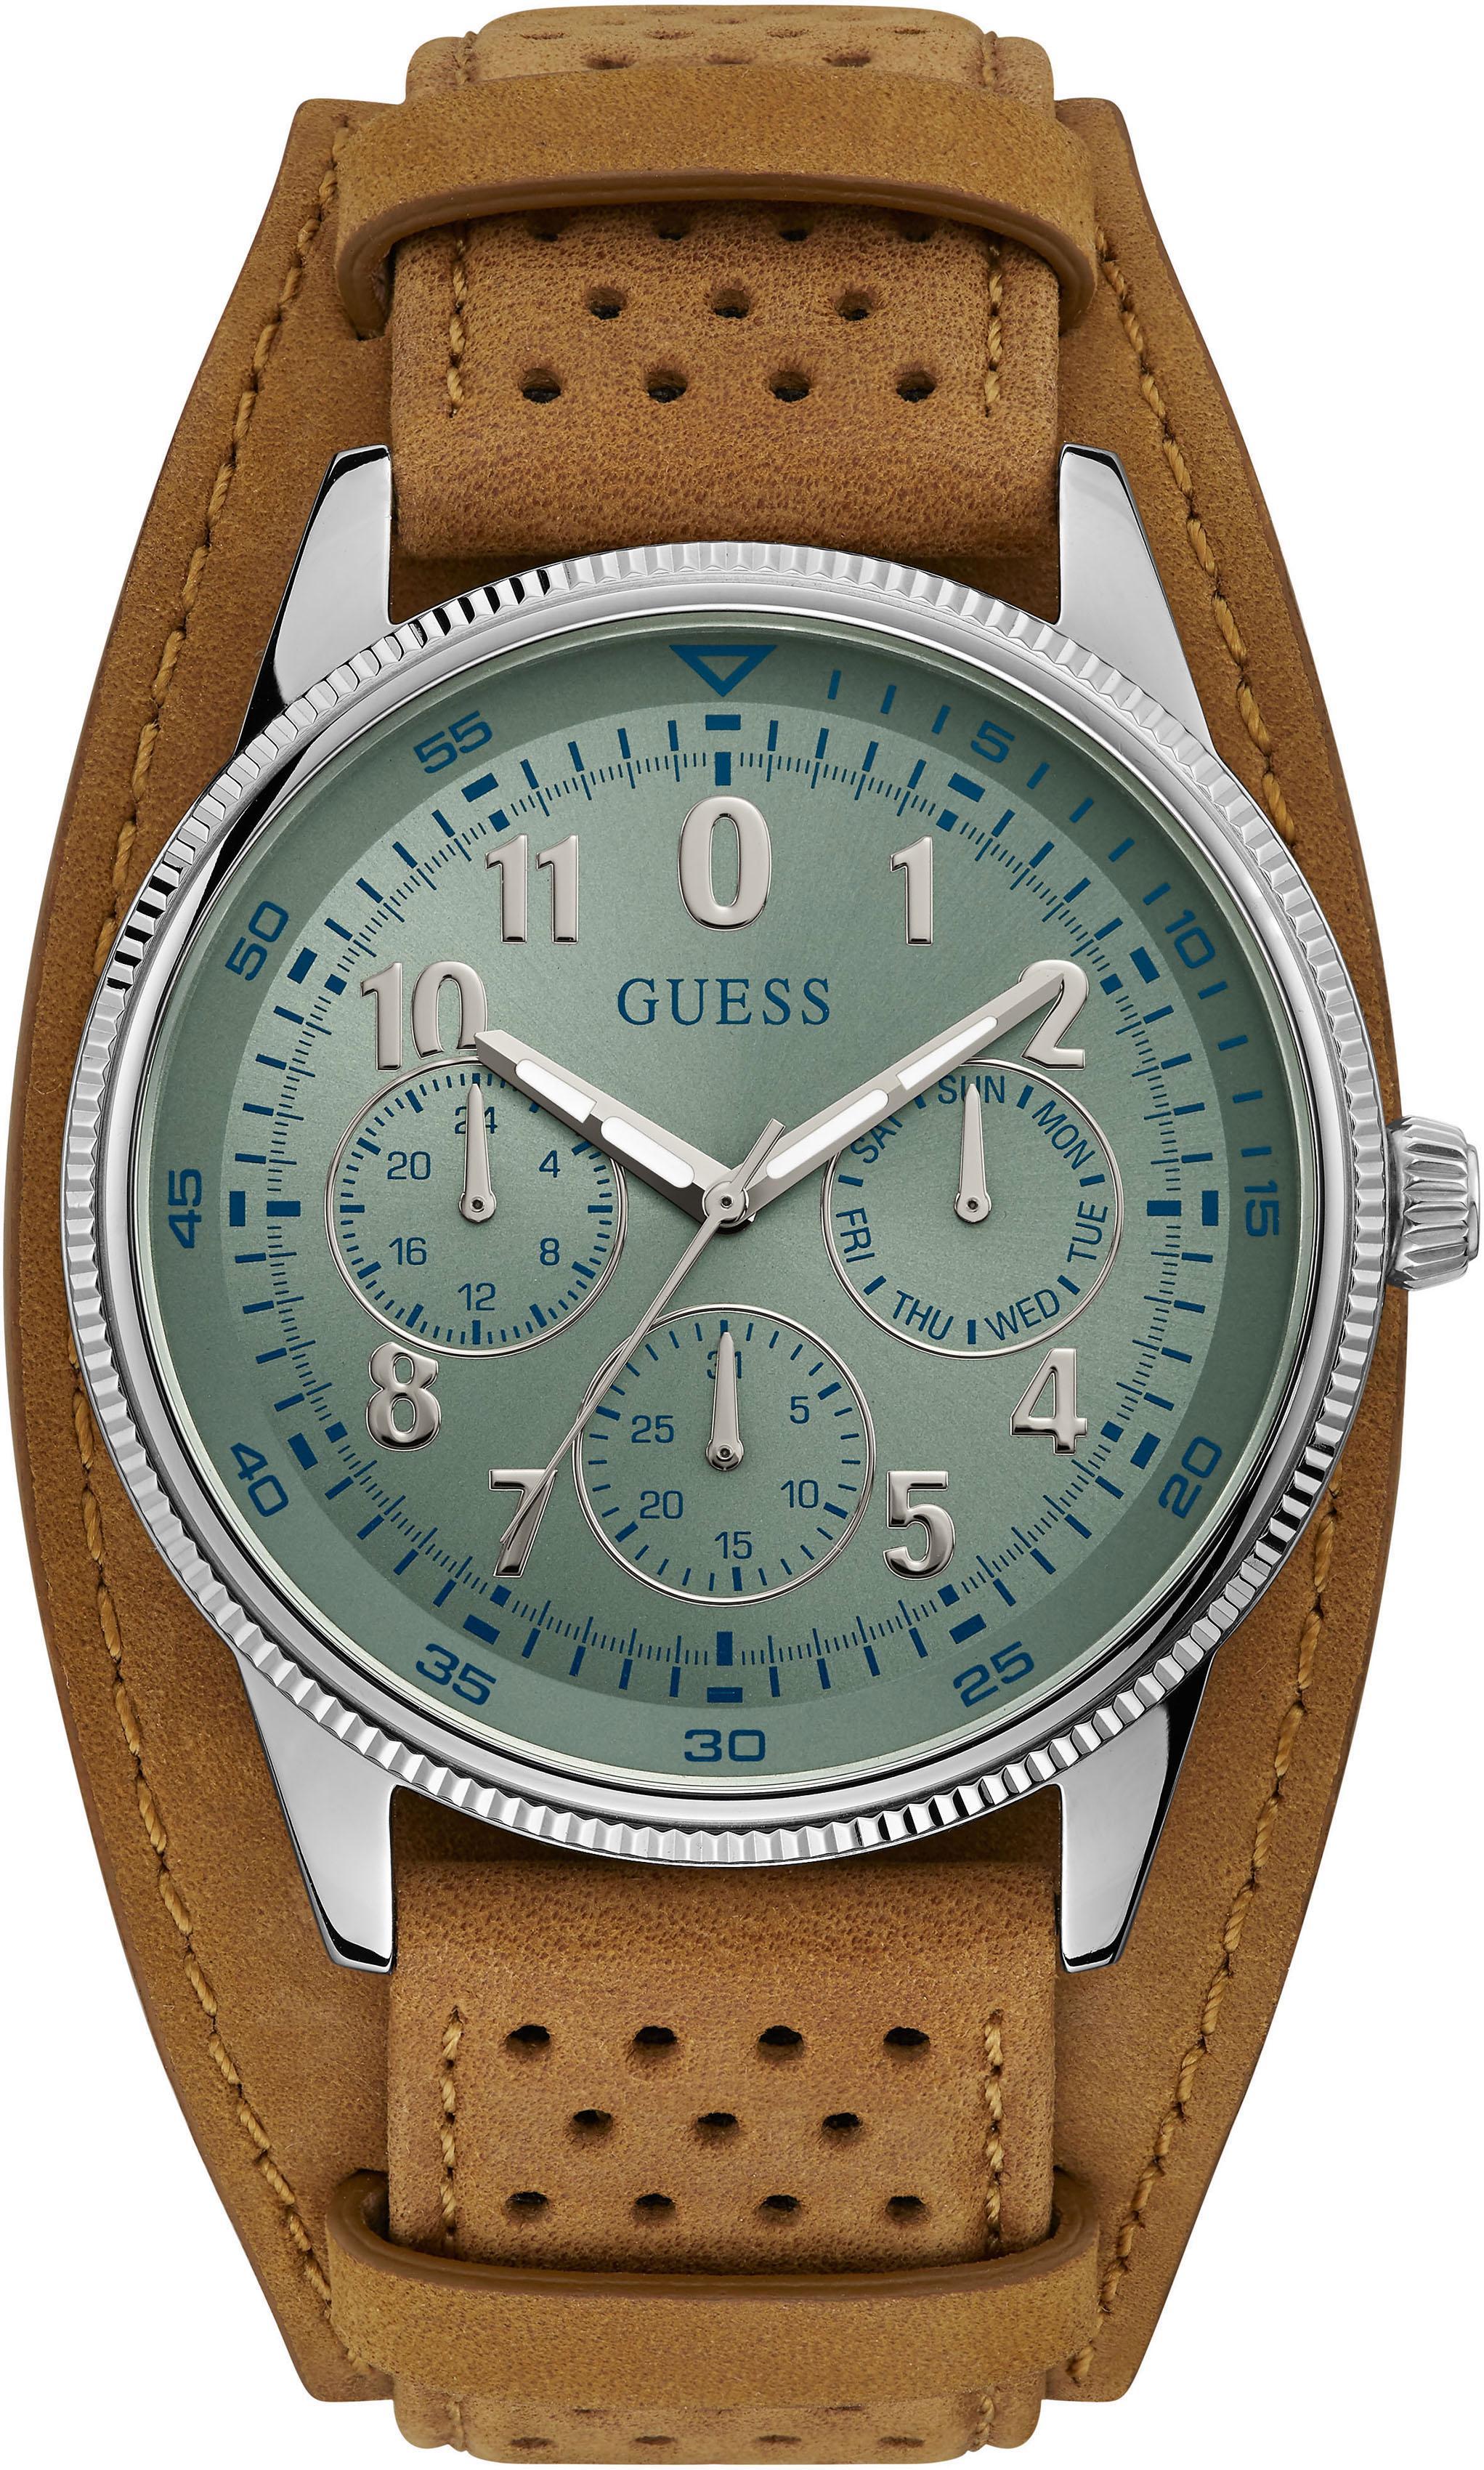 Guess Multifunktionsuhr TERRAIN, W1243G1 | Uhren > Multifunktionsuhren | Guess